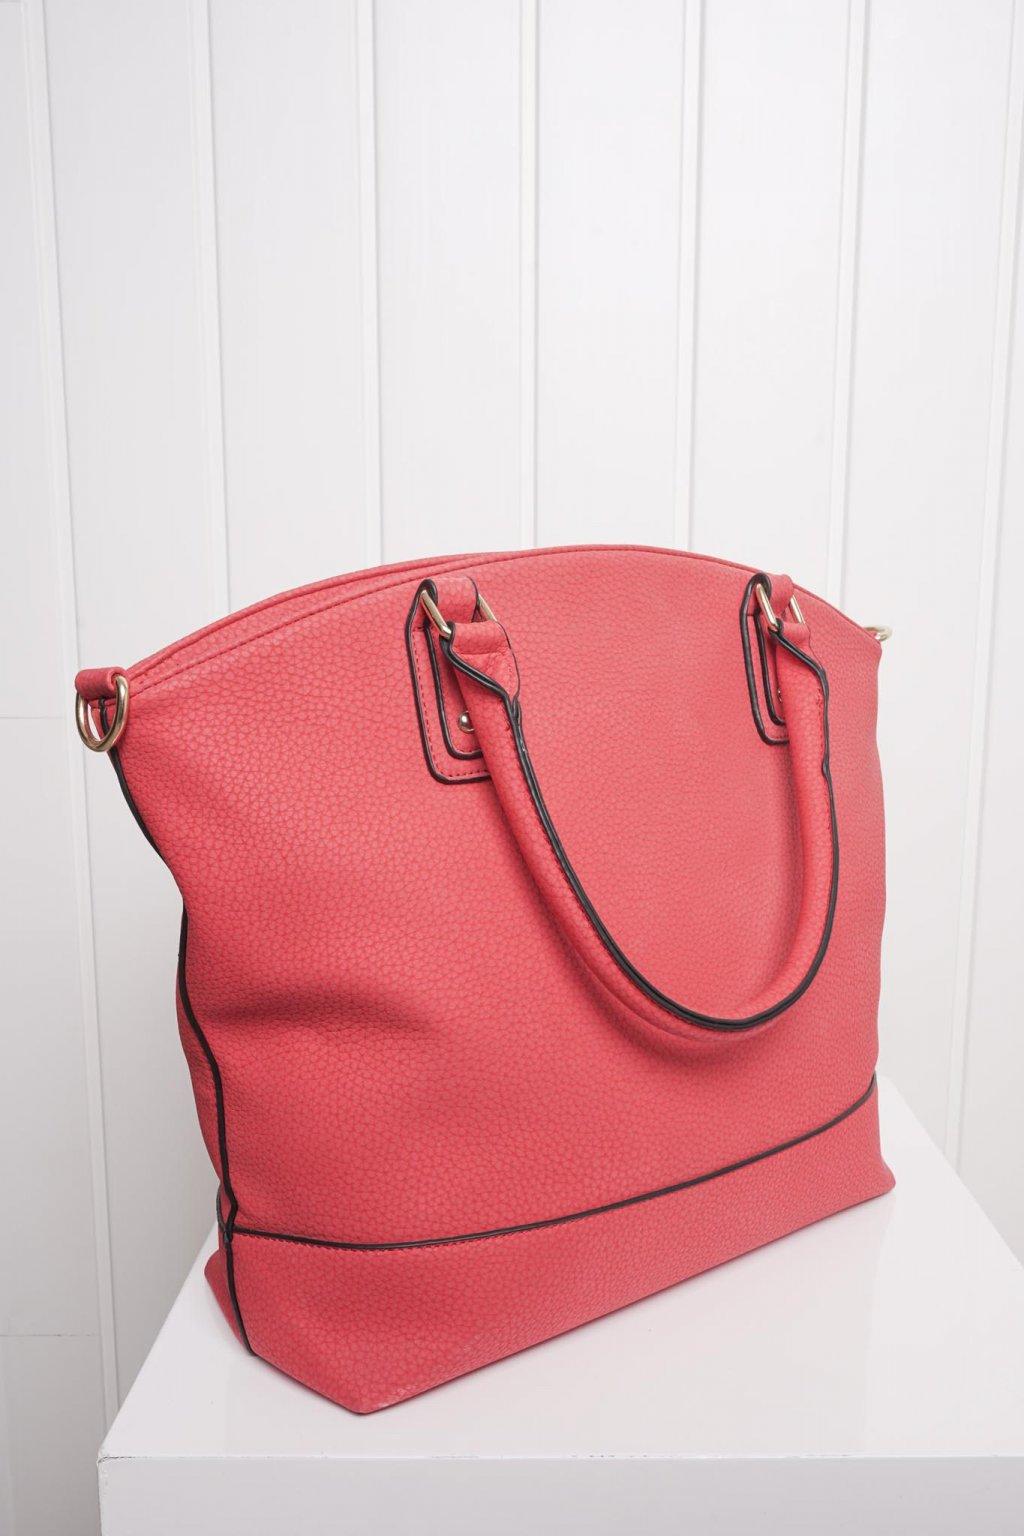 Kabelka, ruksak, dobrá cena, čierna kabelka, čierny ruksak, basic, kabelky, ruksaky 083